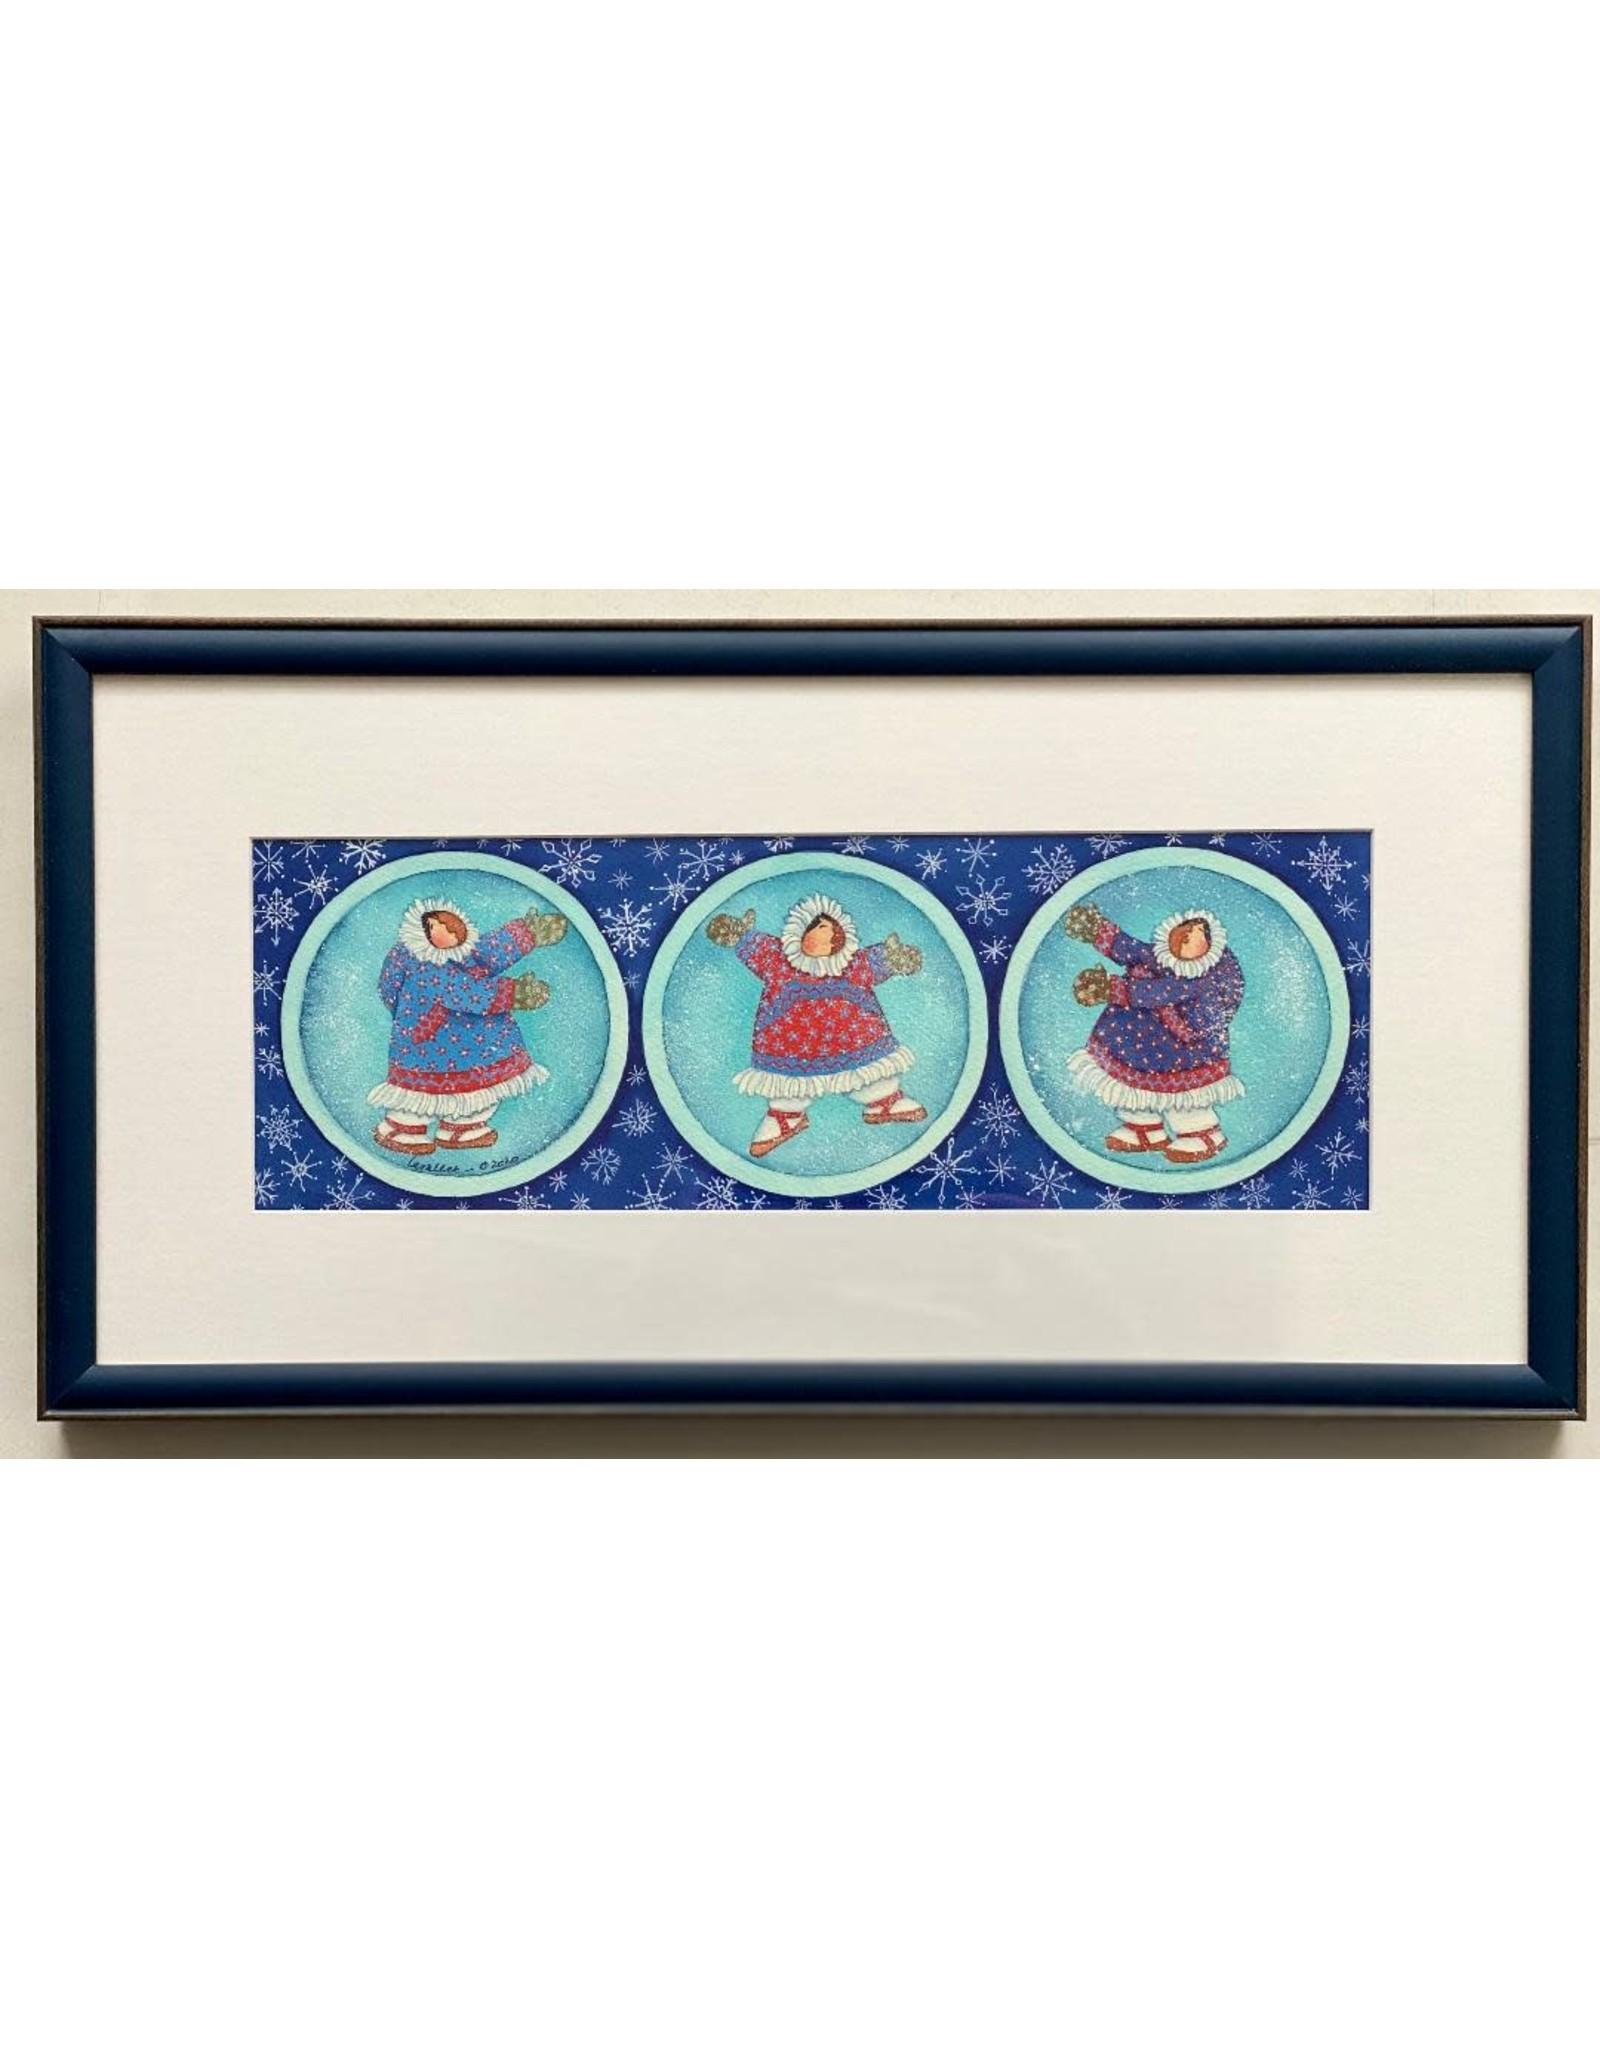 Barbara Lavallee Snow Globes (framed original) | Barbara Lavallee